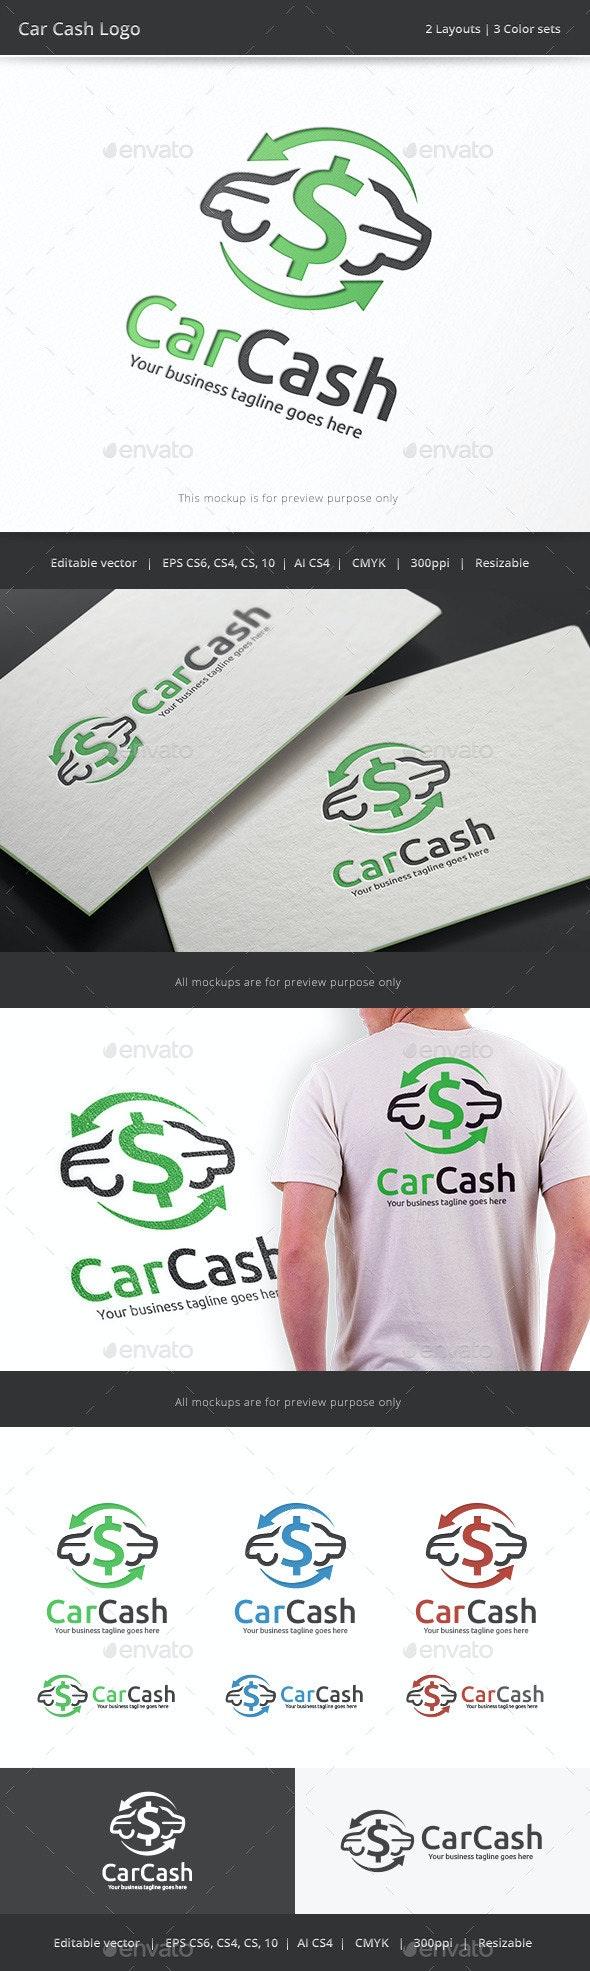 Car Cash Logo - Objects Logo Templates